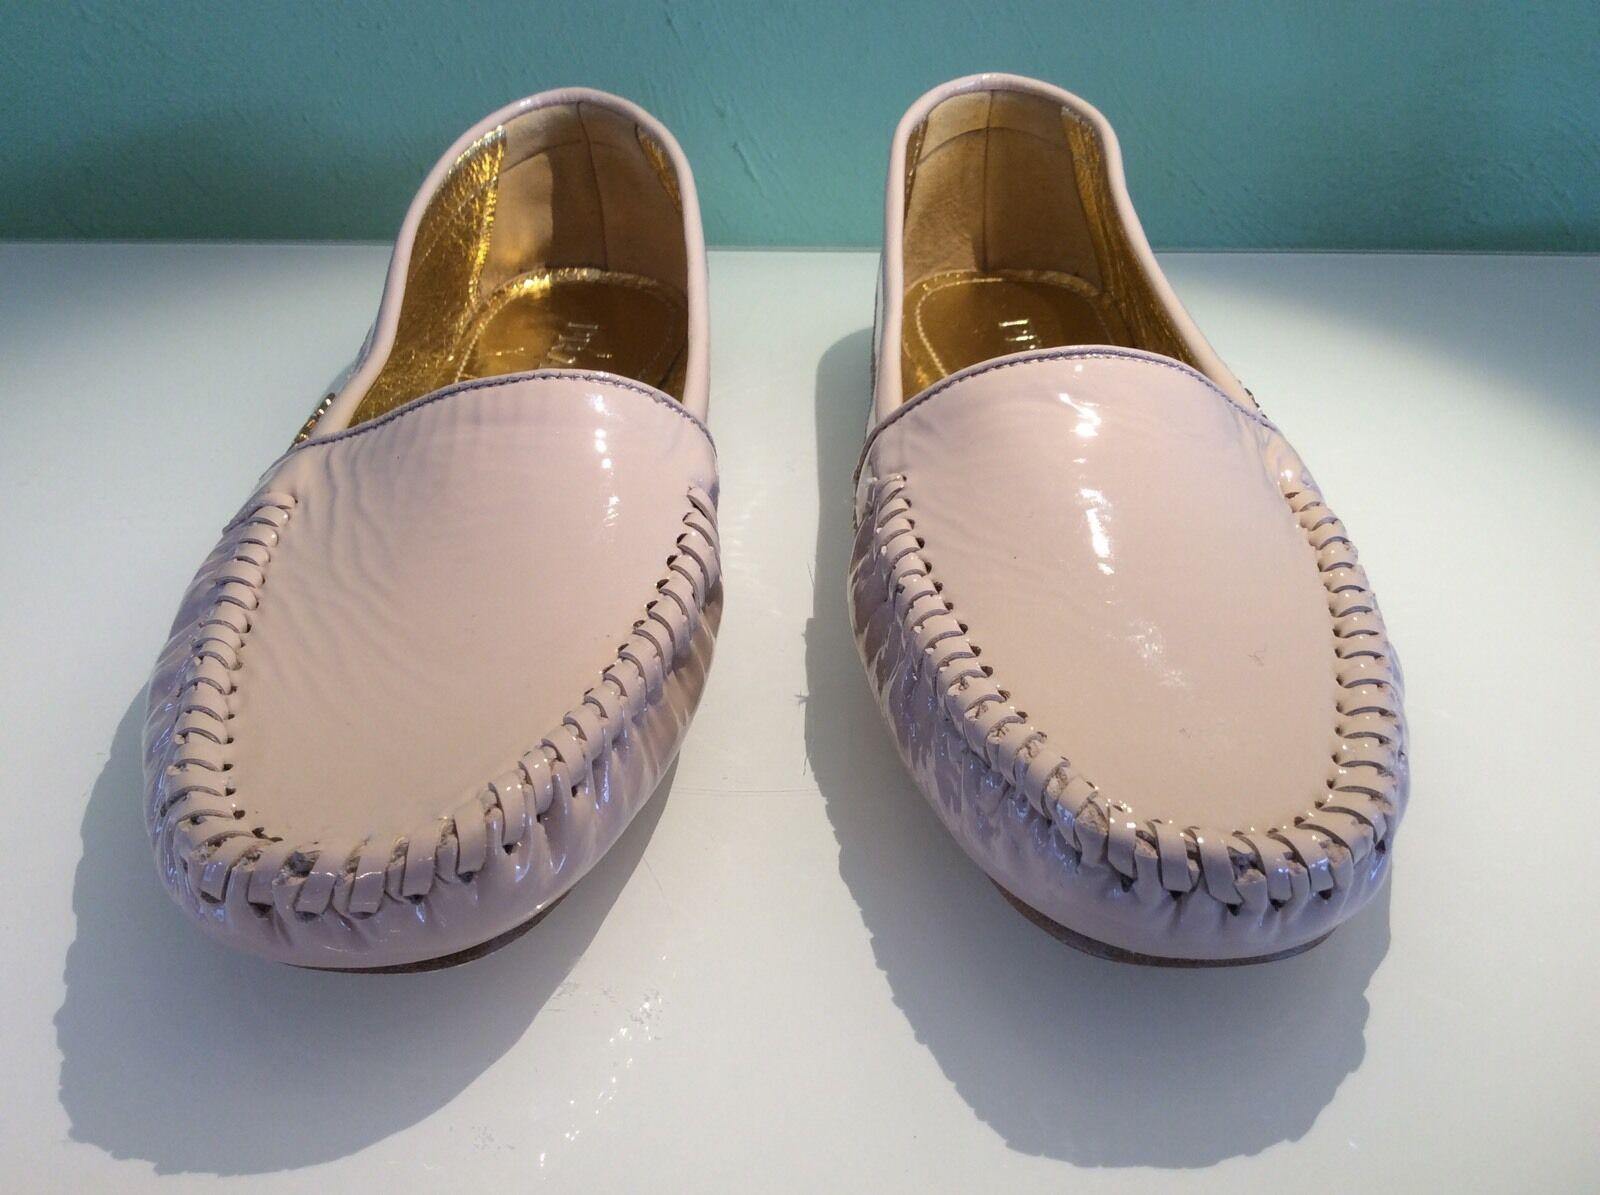 New Prada Braided Patent Leather Moccsin Flat shoes (36)